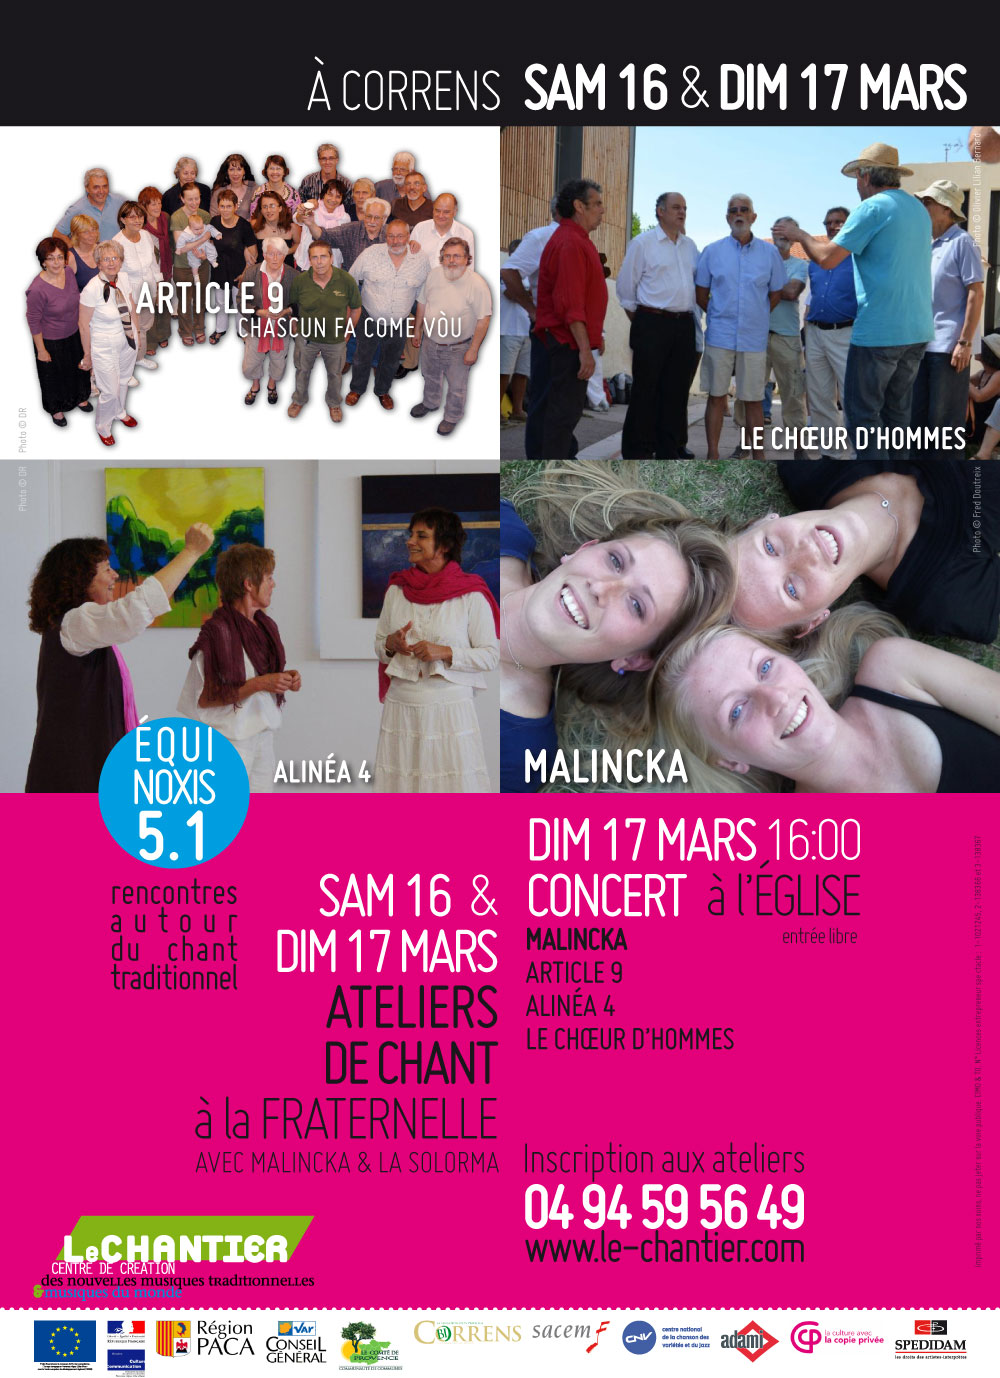 Equinòxis 5.1 : Rencontres autour du chant traditionnel. Article 9 invite Malincka - Sam 16 & Dim 17 mars 2013